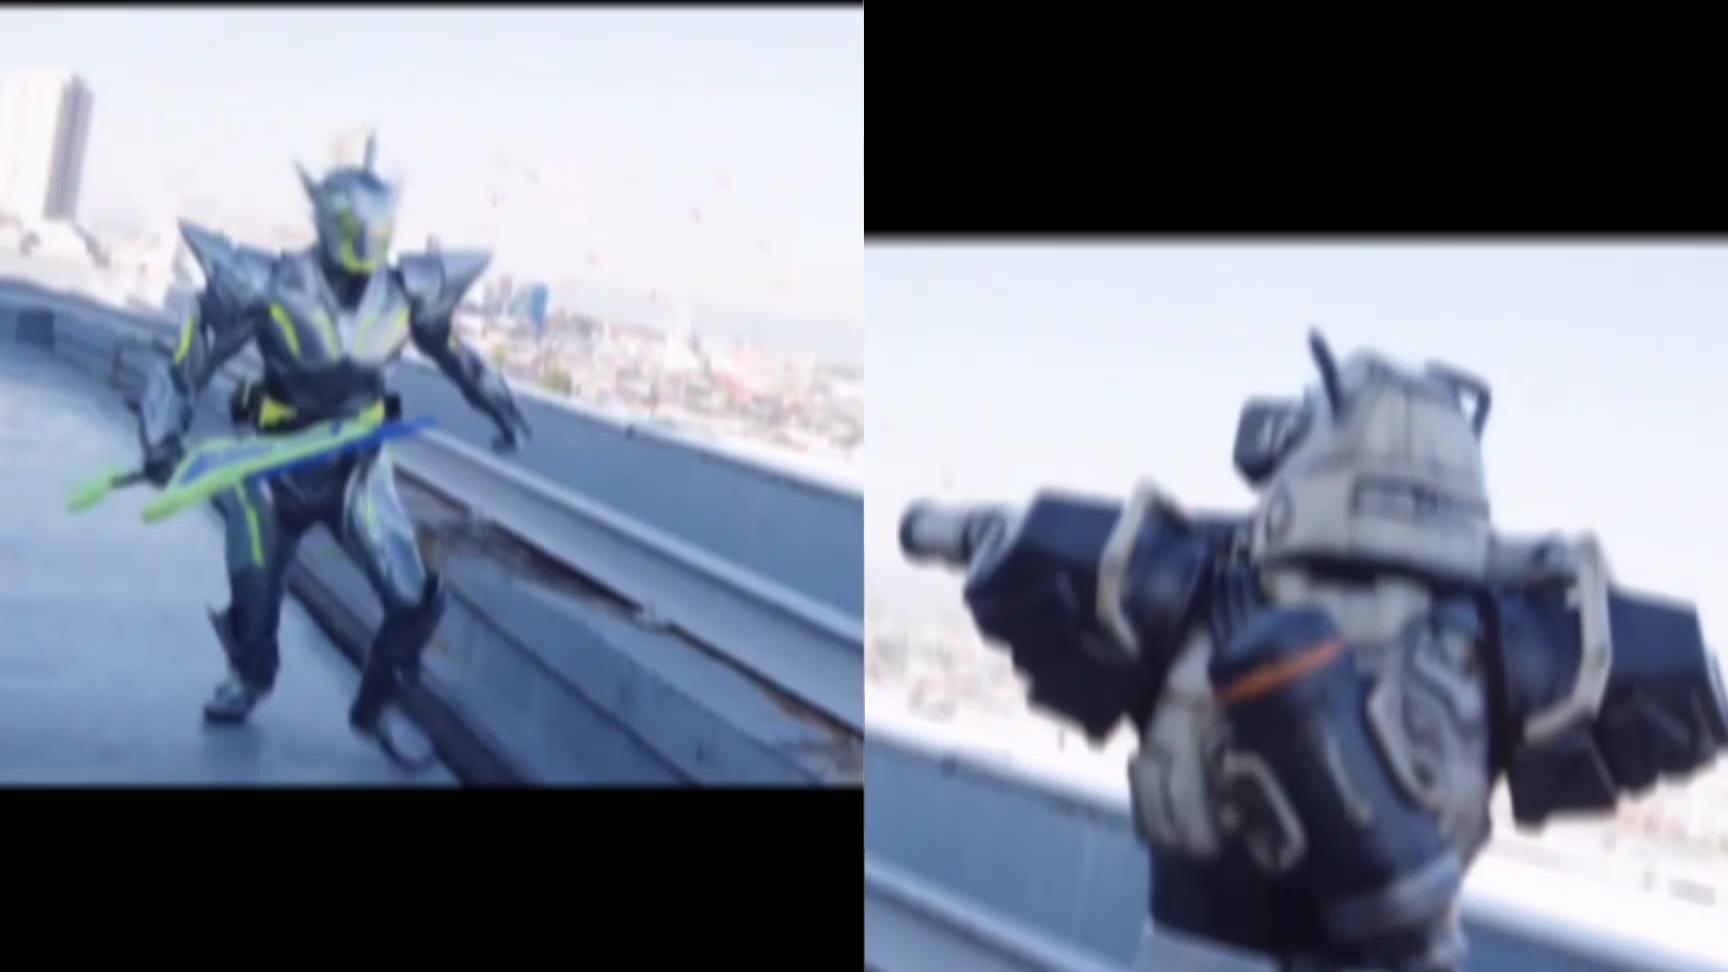 【UP主基本功大赛】假面骑士01 26话 战斗集锦 电影级踩点